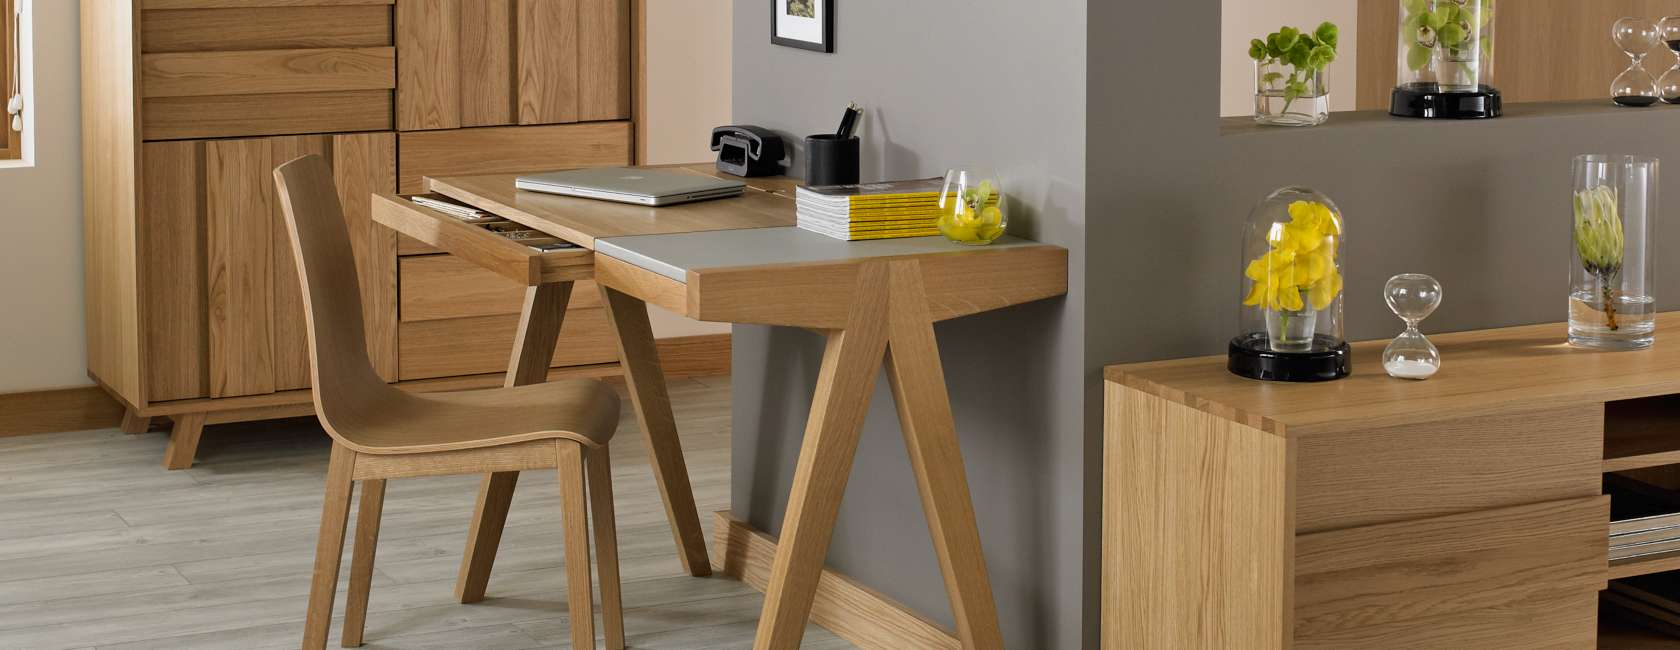 Bethan Gray For John Lewis Noah Dining Room Furniture Oak